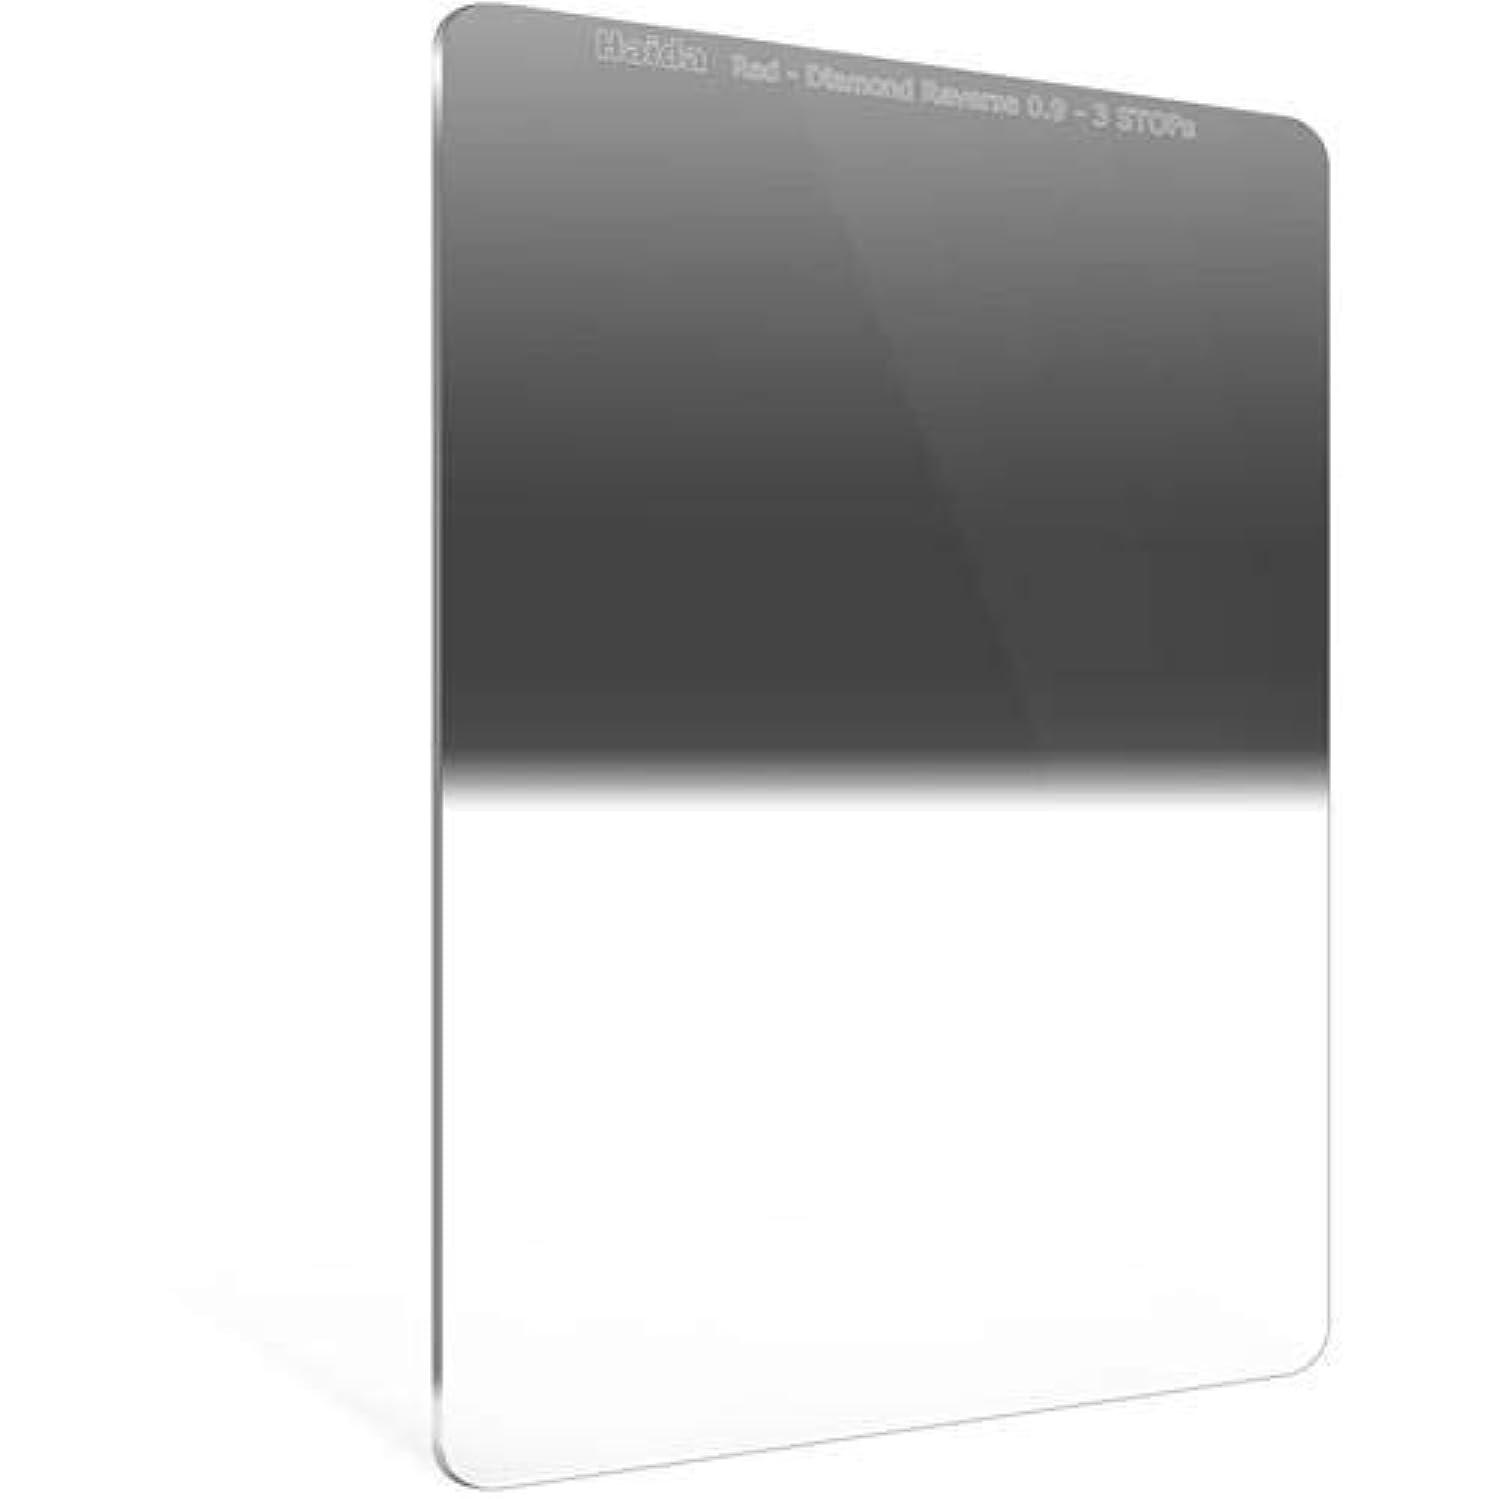 Haida Red Diamond 100mm 0.9 3 Stop Reverse Graduated ND Nanopro Coated Glass Filter 4x6 100x150mm